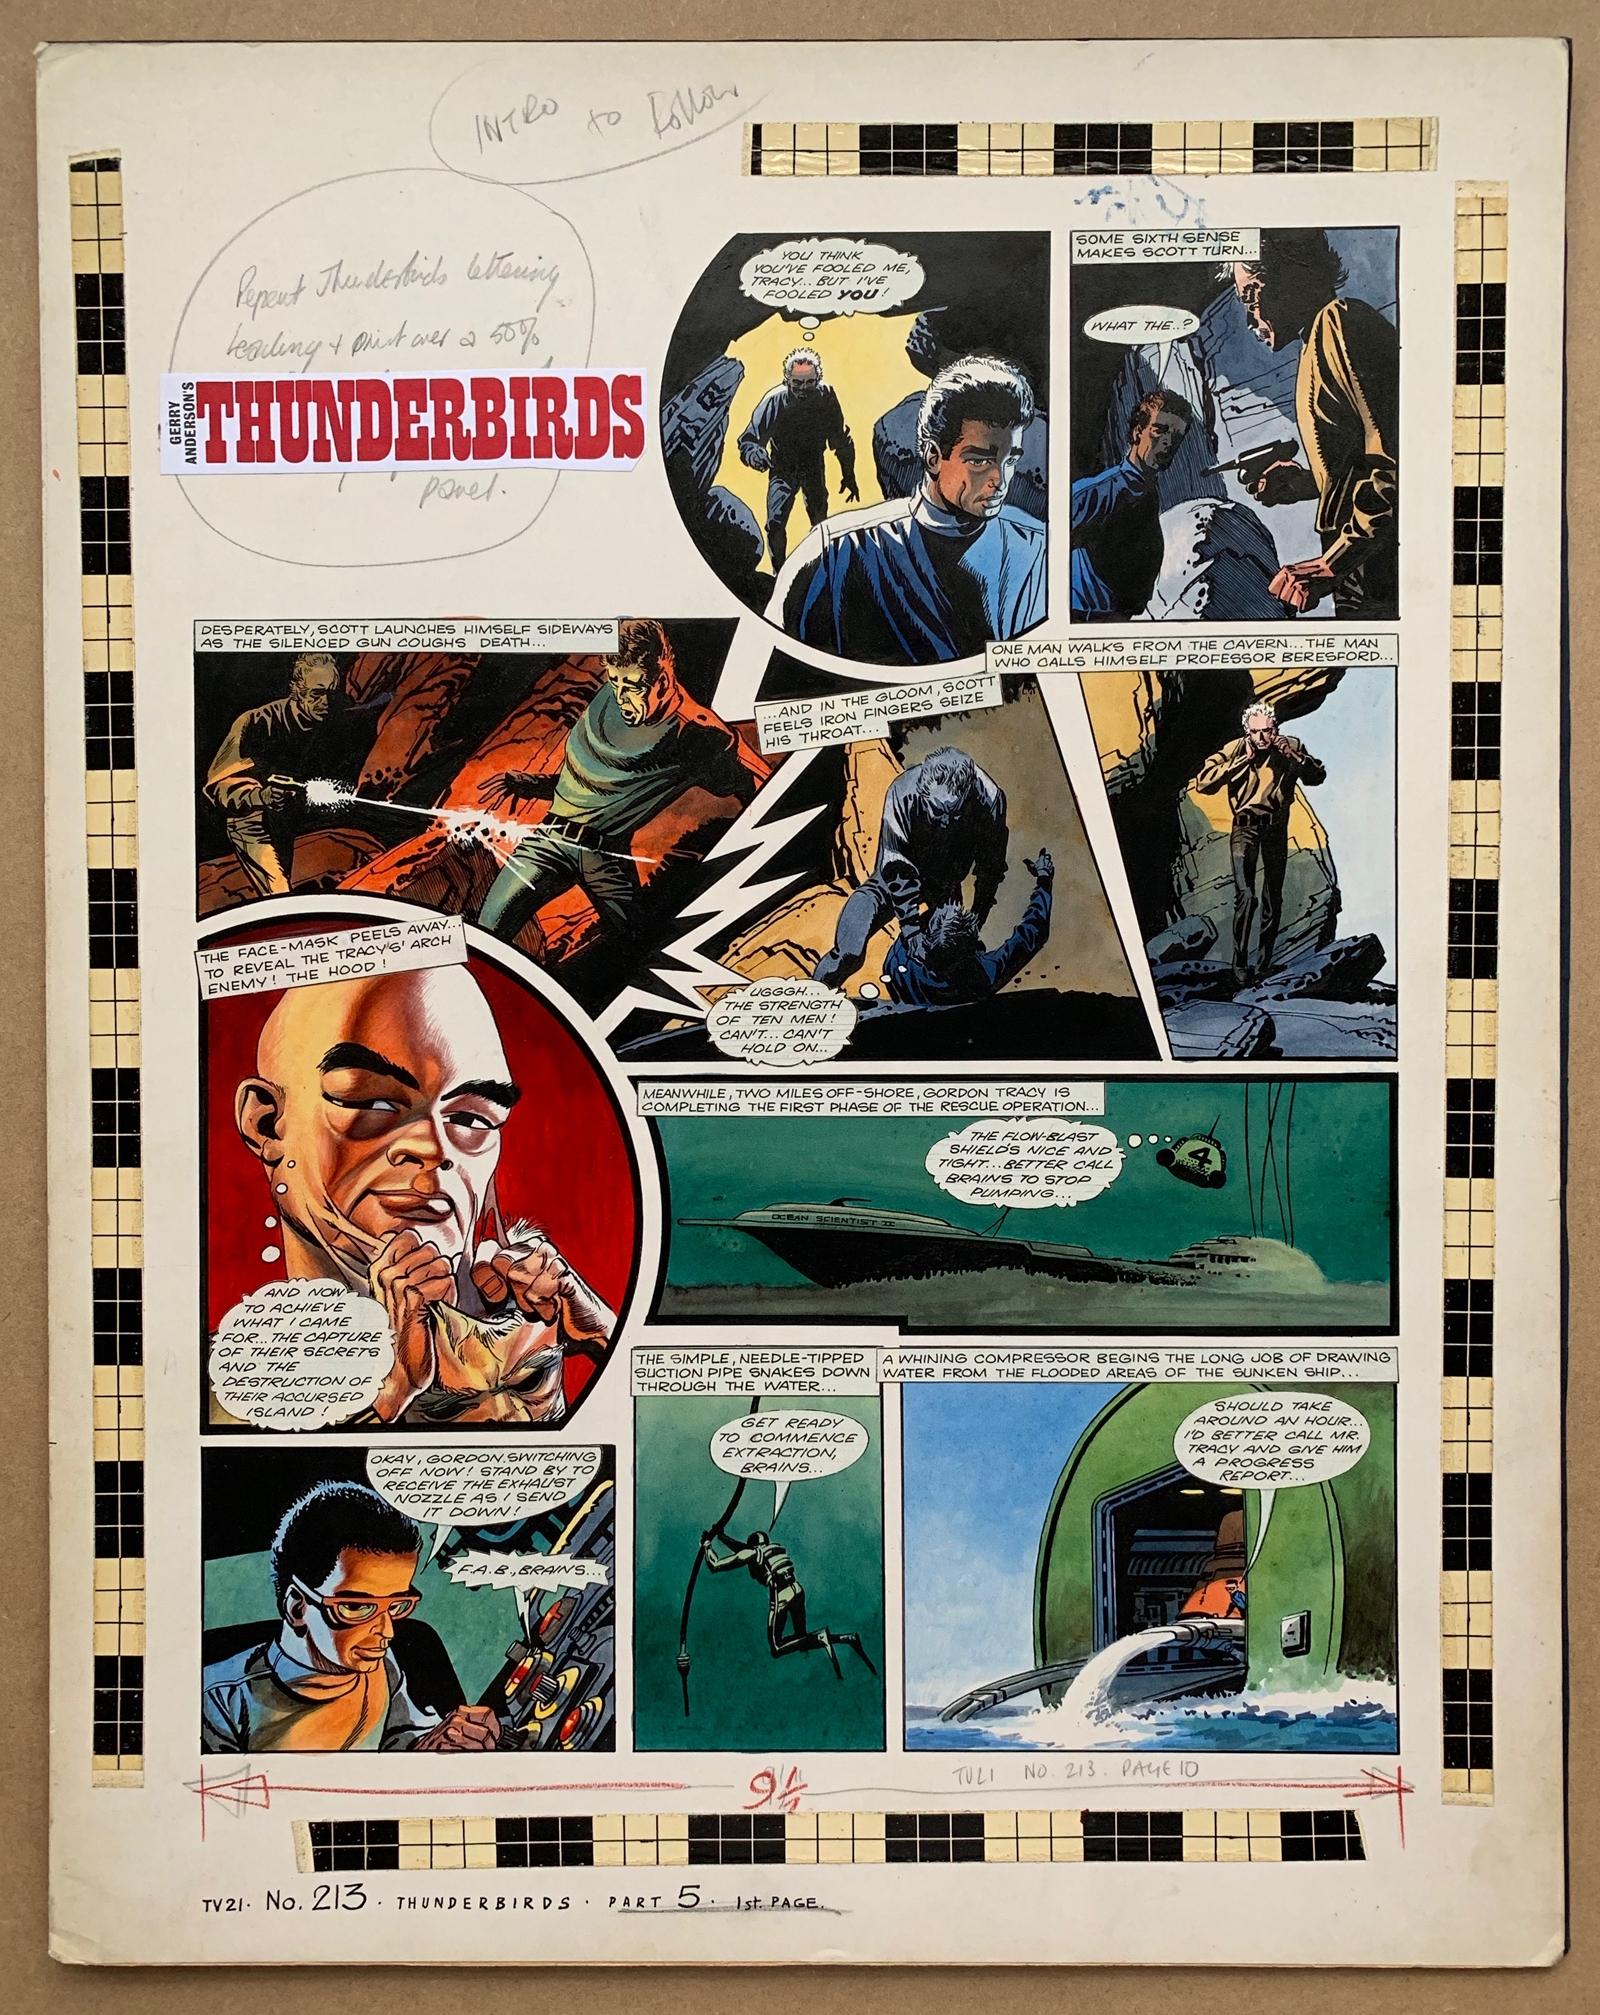 THUNDERBIRDS (1969) - ORIGINAL ARTWORK from TV21 C